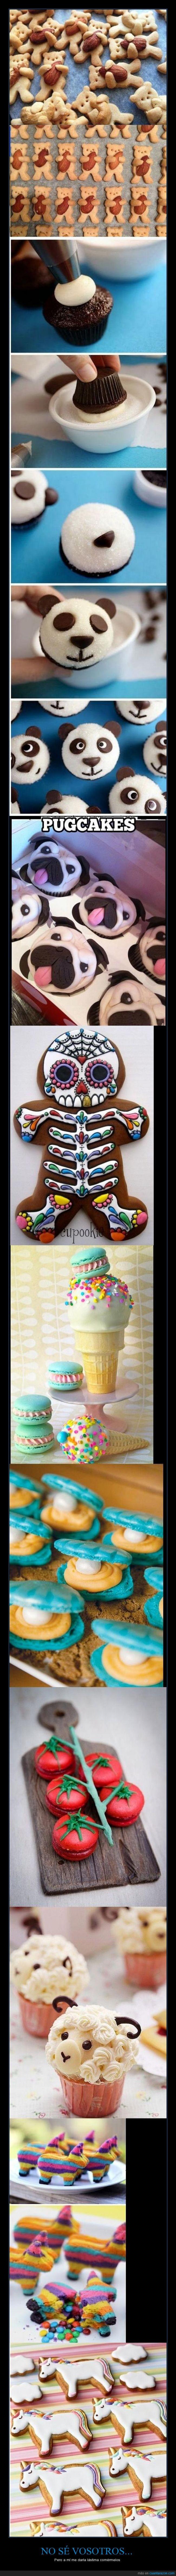 pasteles comidas